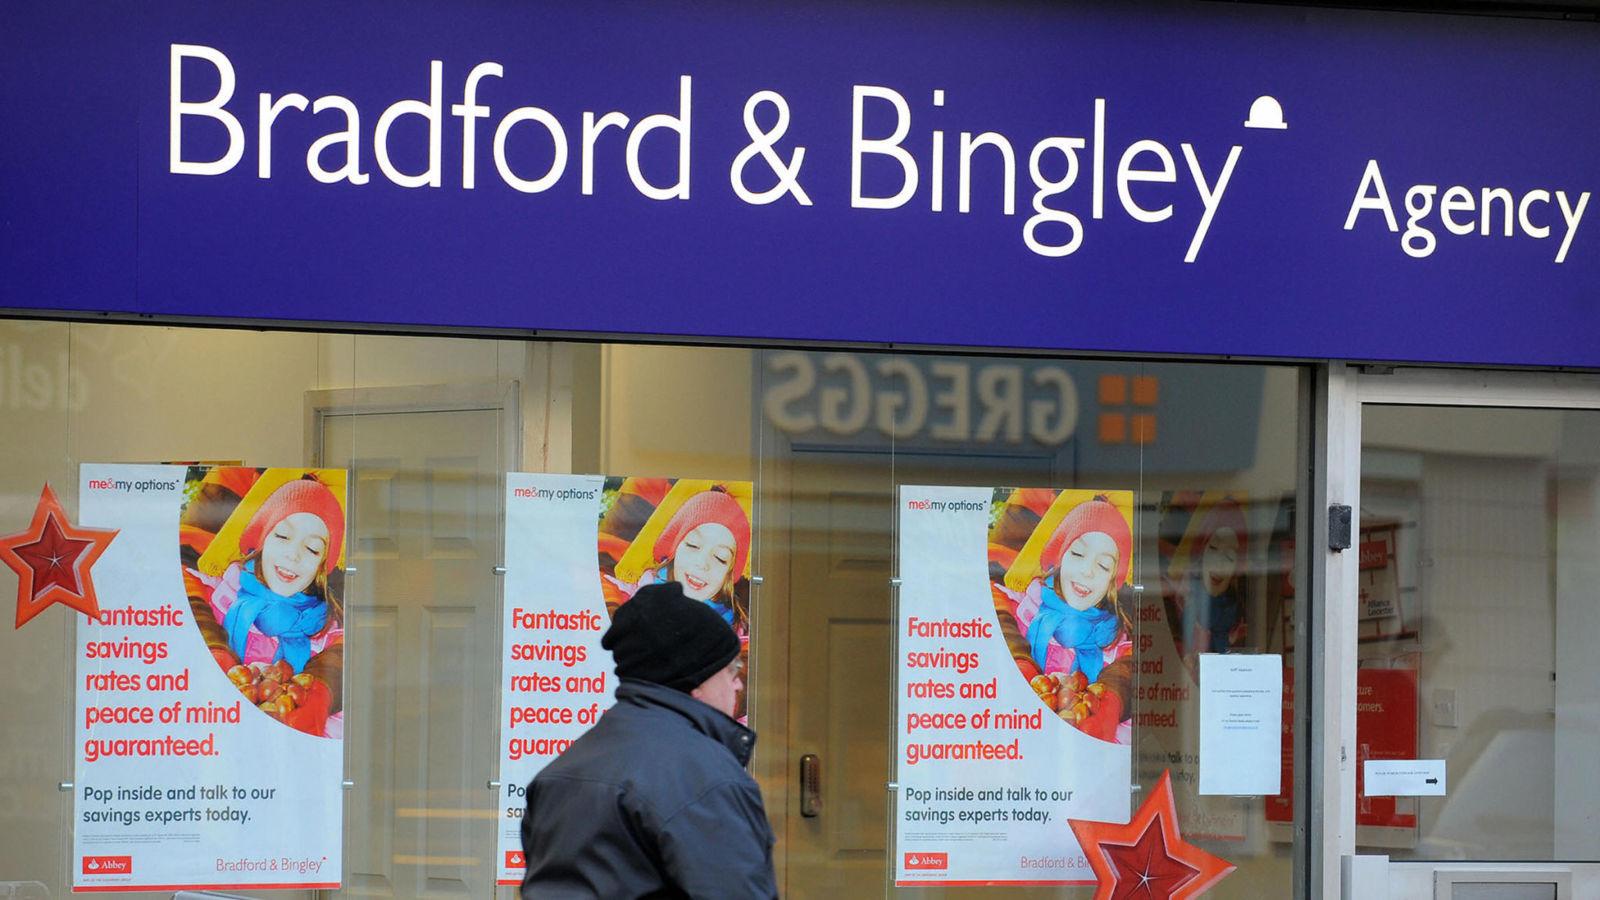 Ministers eye £6bn Bradford & Bingley sale